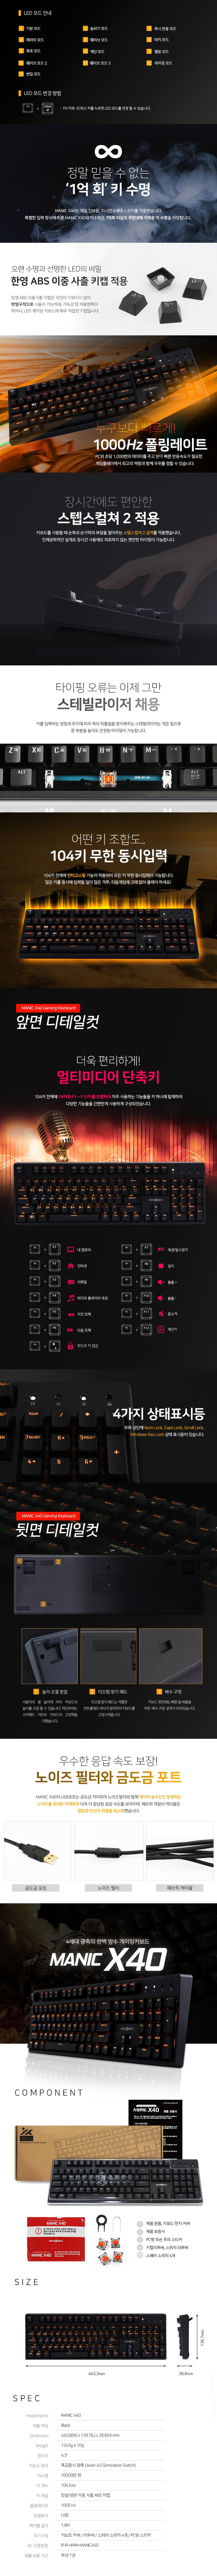 MANIC-X40-2.jpg